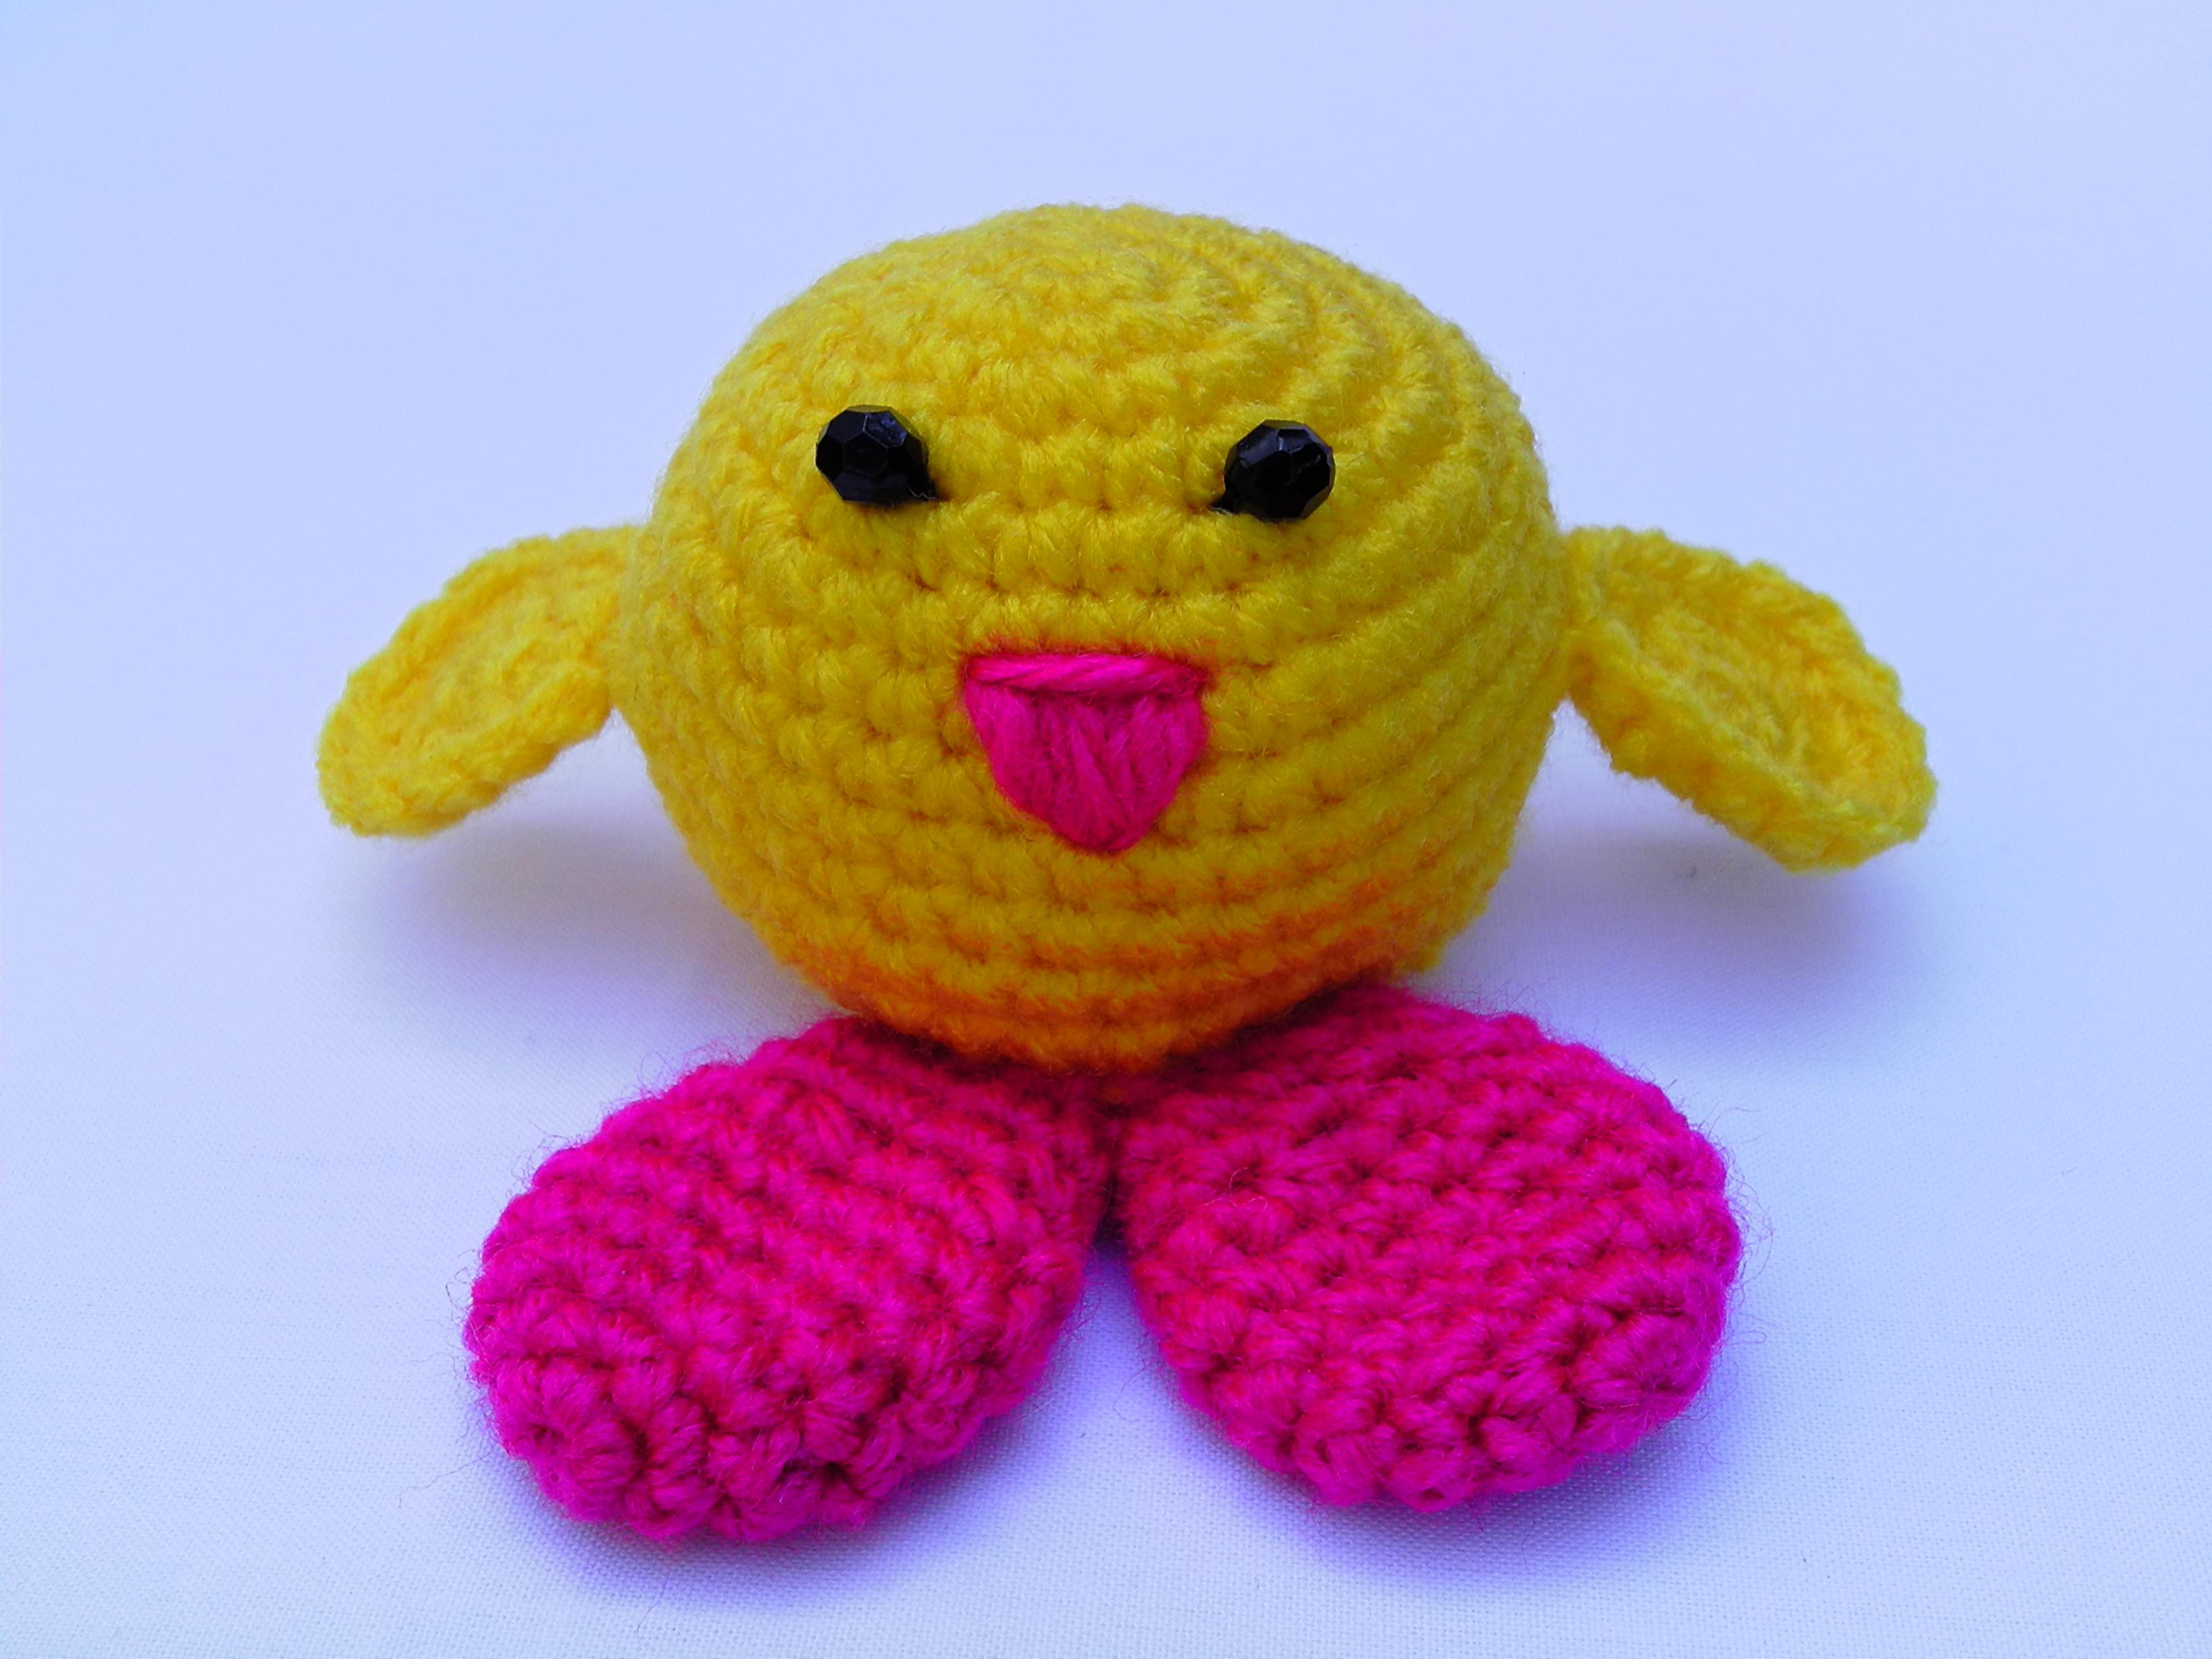 Amigurumi Crochet Toys : Amigurumi Chicken Crochet Toy on Storenvy